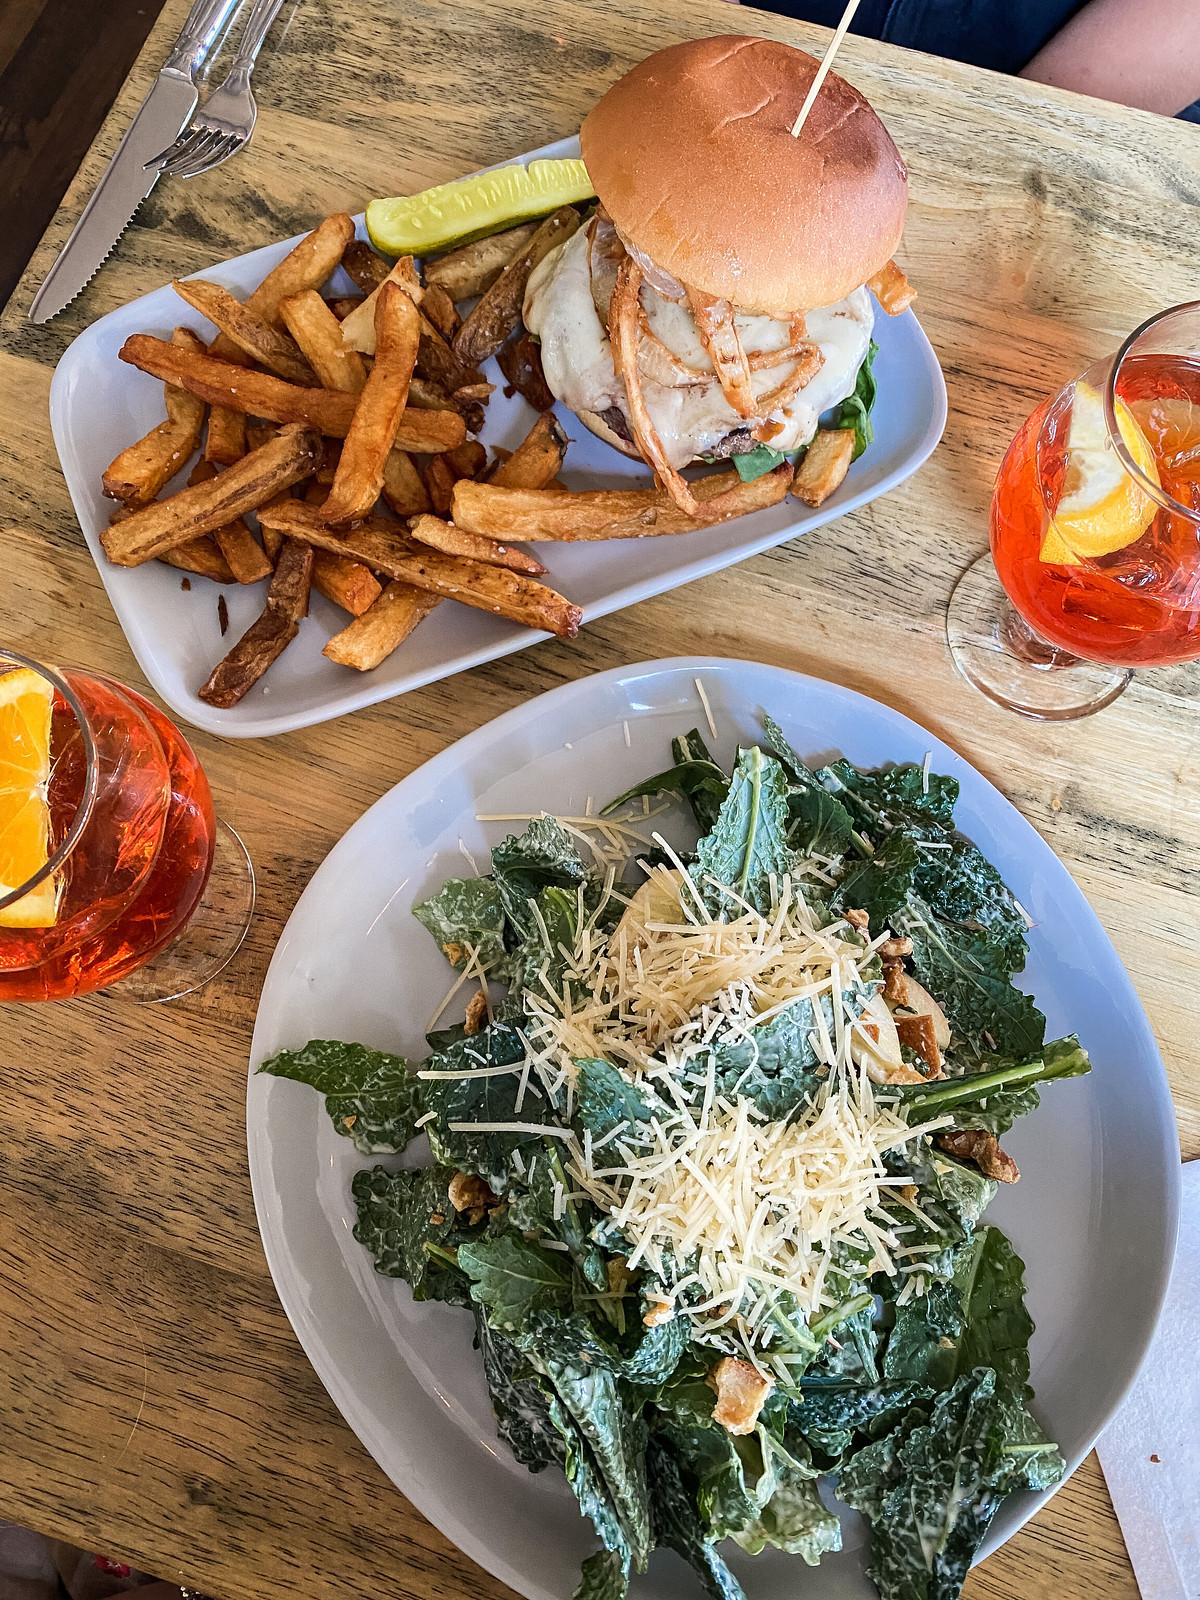 Kale Caesar Salad & Really Good Burger